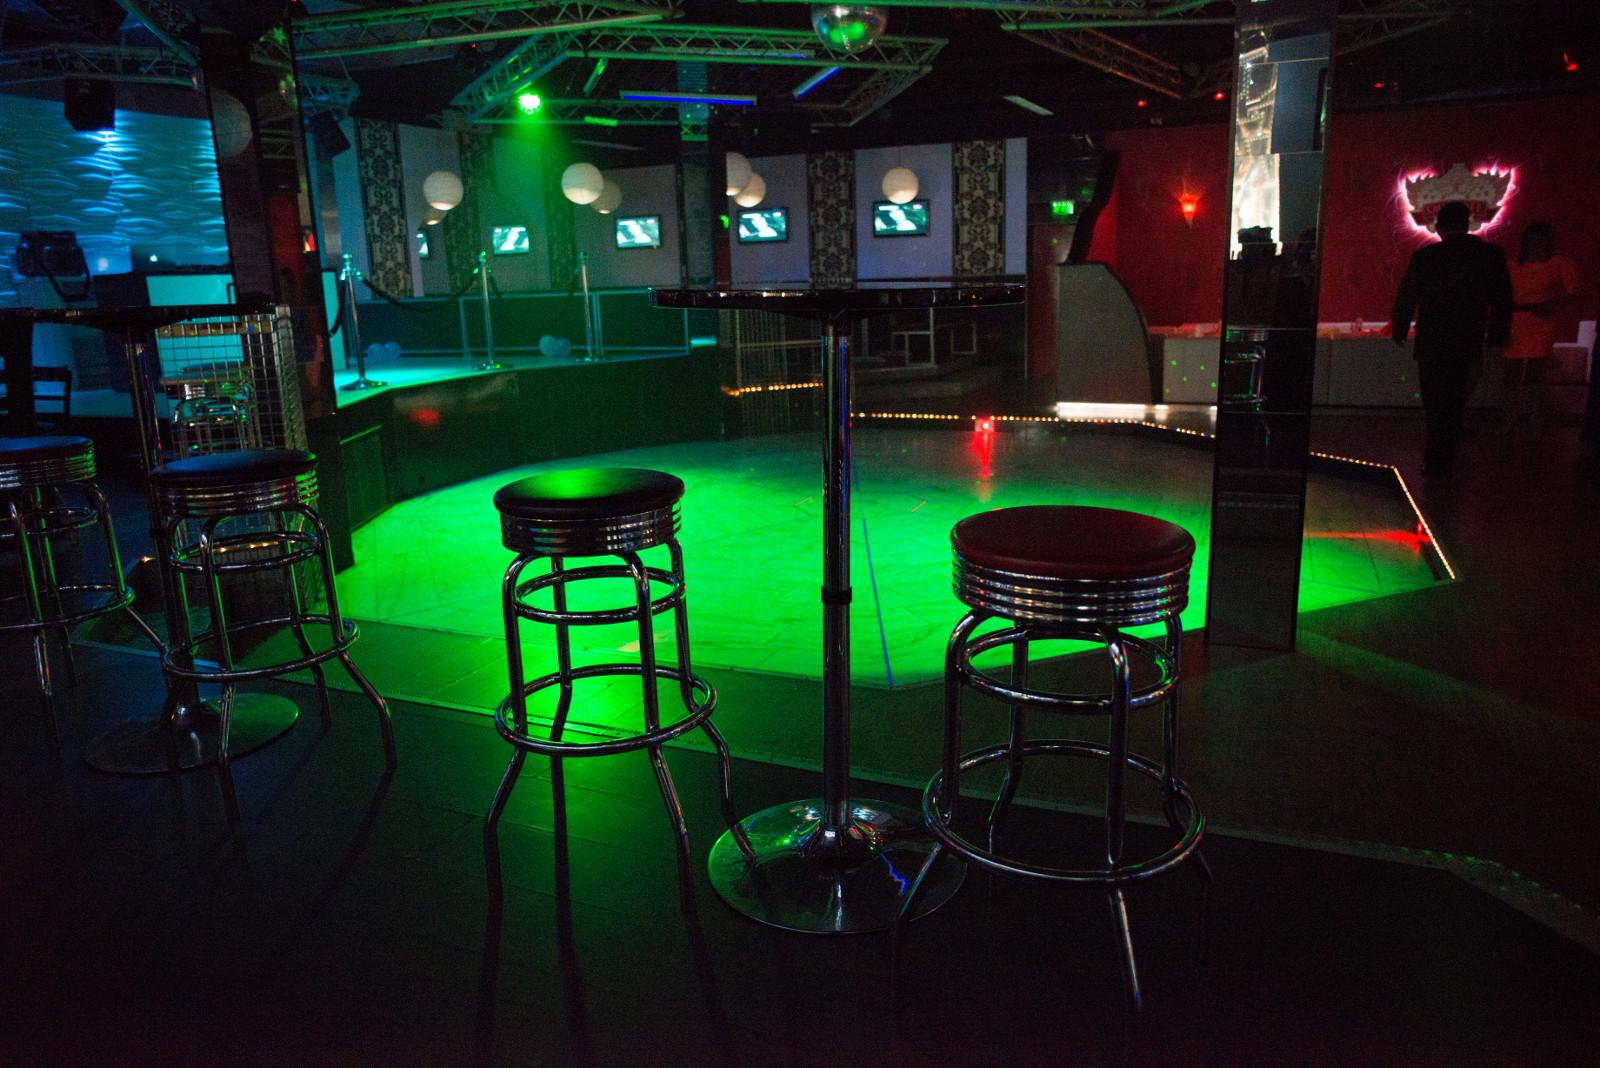 3D Wandpaneele - Referenzen - Elis Club & Lounge - Deckenpaneele - 3D Tapeten - Wandverkleidung